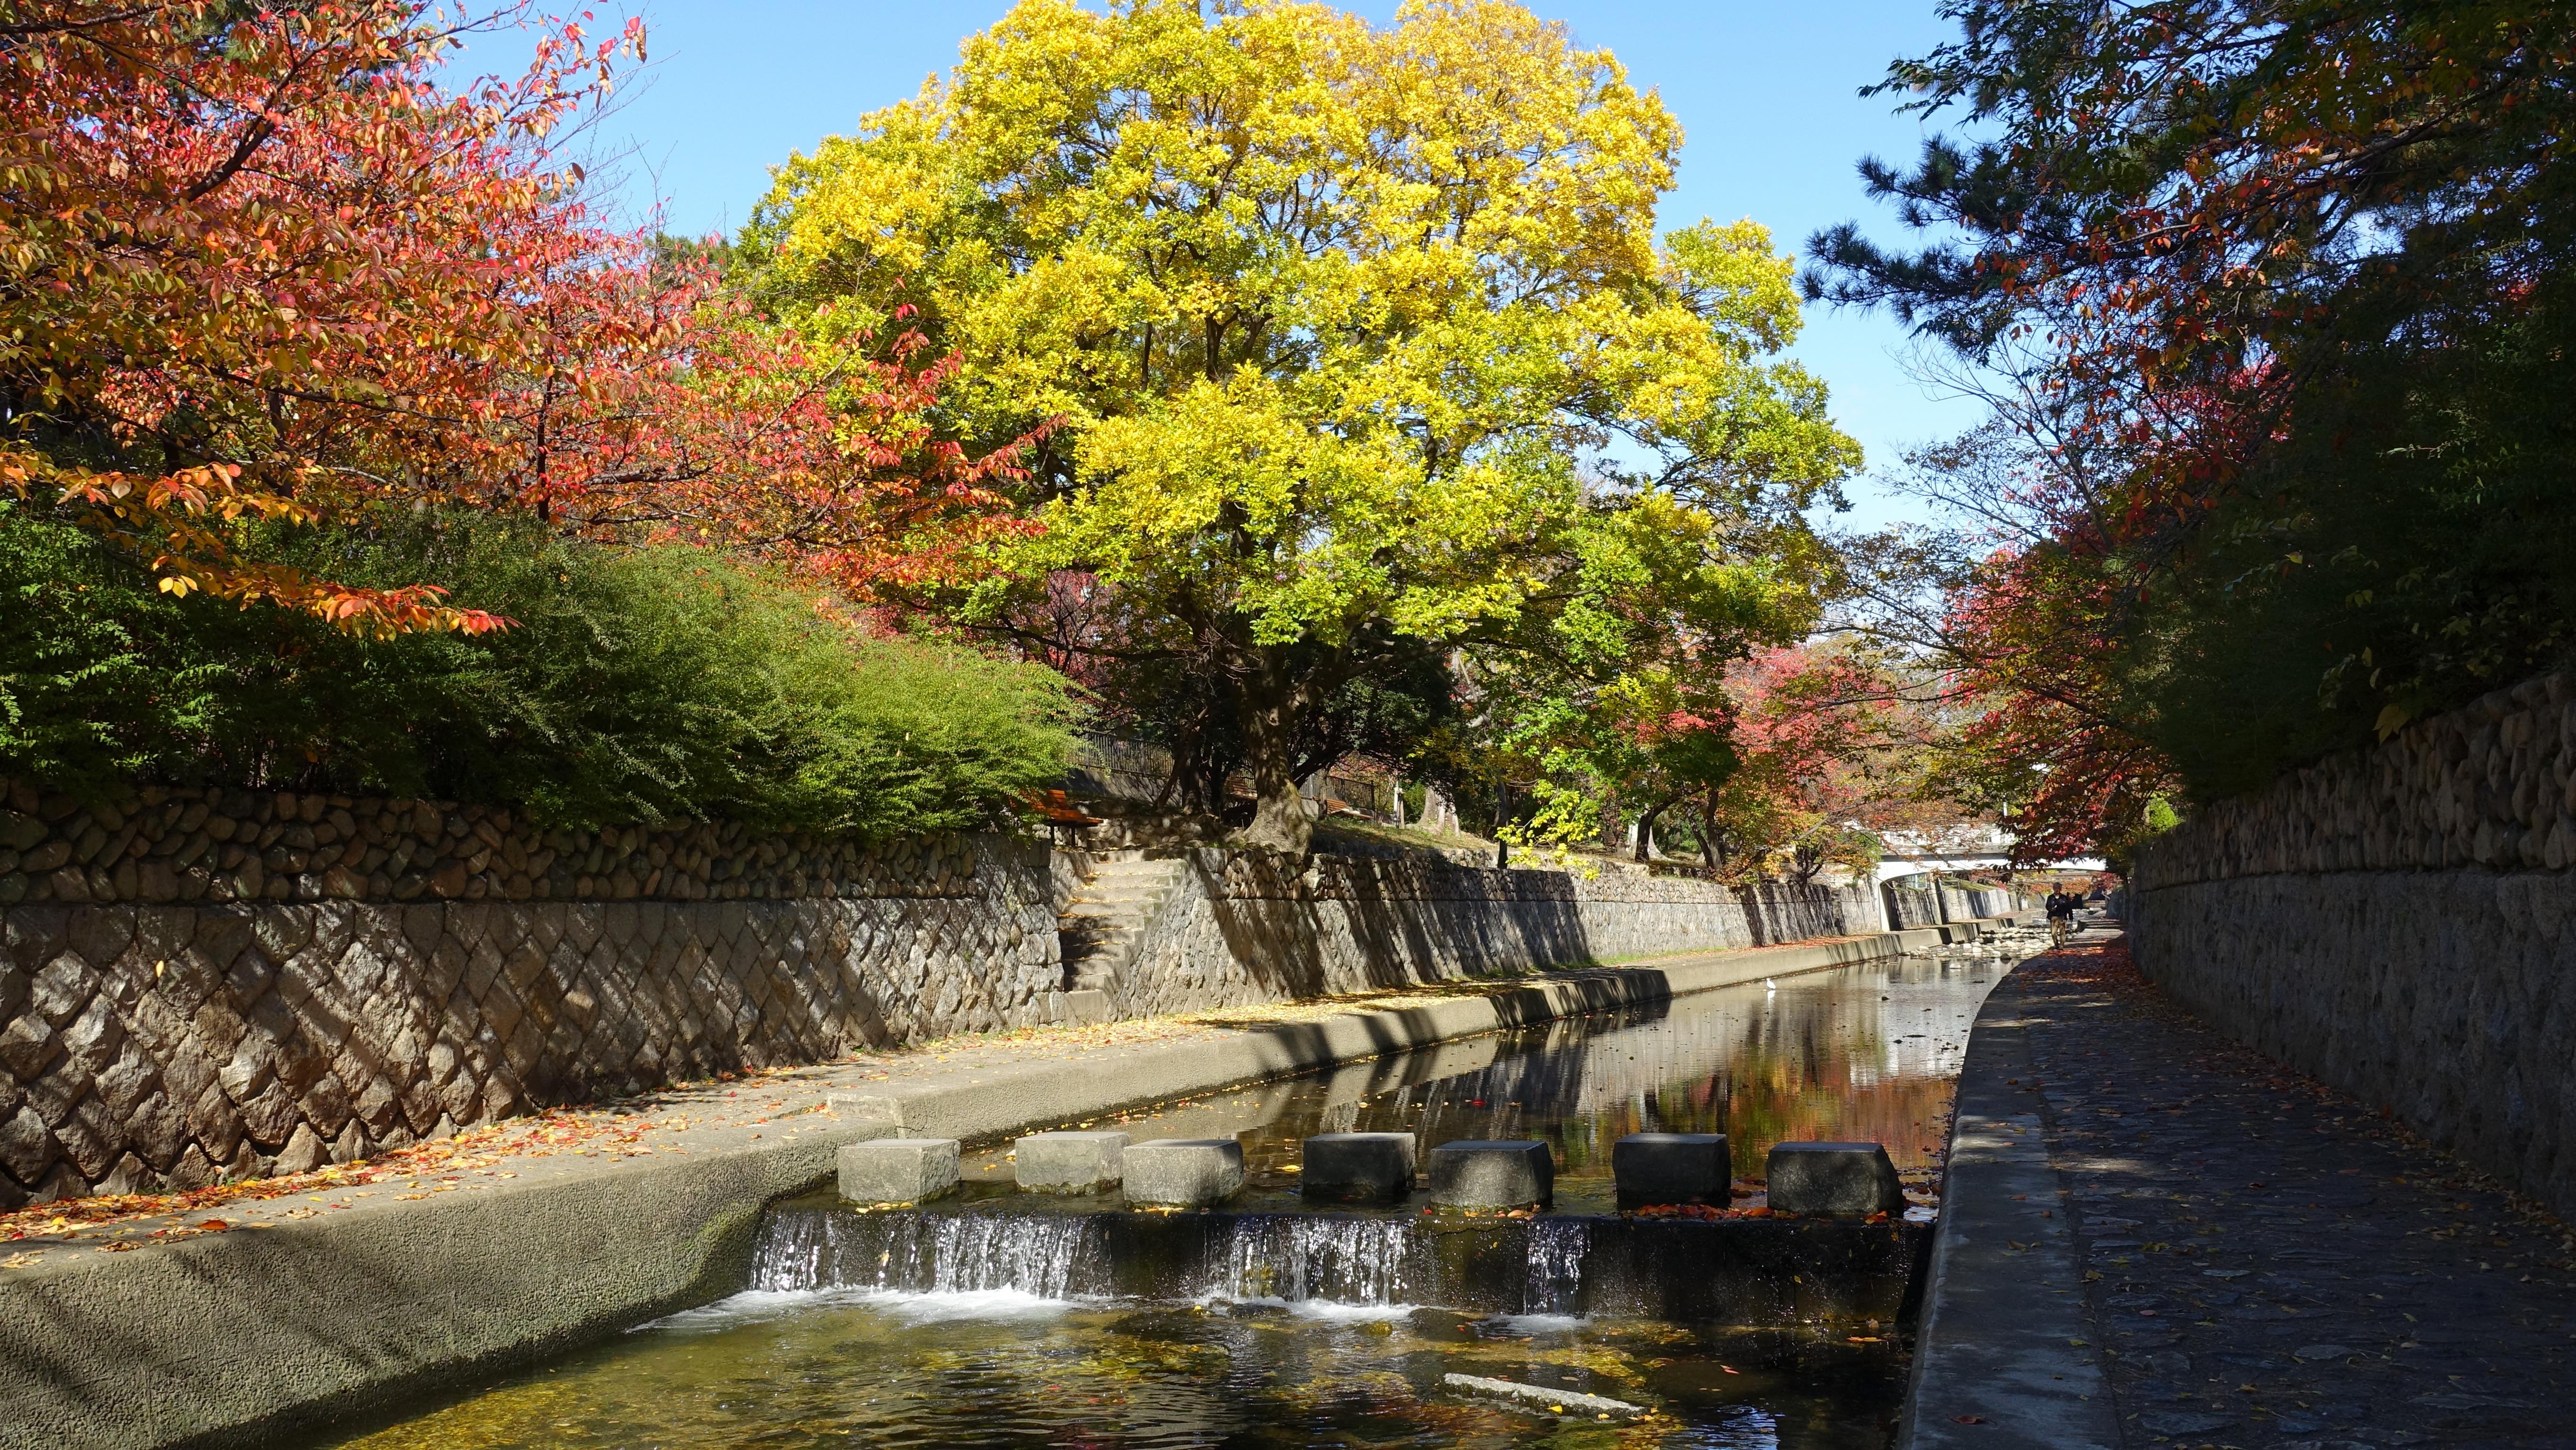 https://cdn-ak.f.st-hatena.com/images/fotolife/s/shioshiohida/20191120/20191120105450_original.jpg